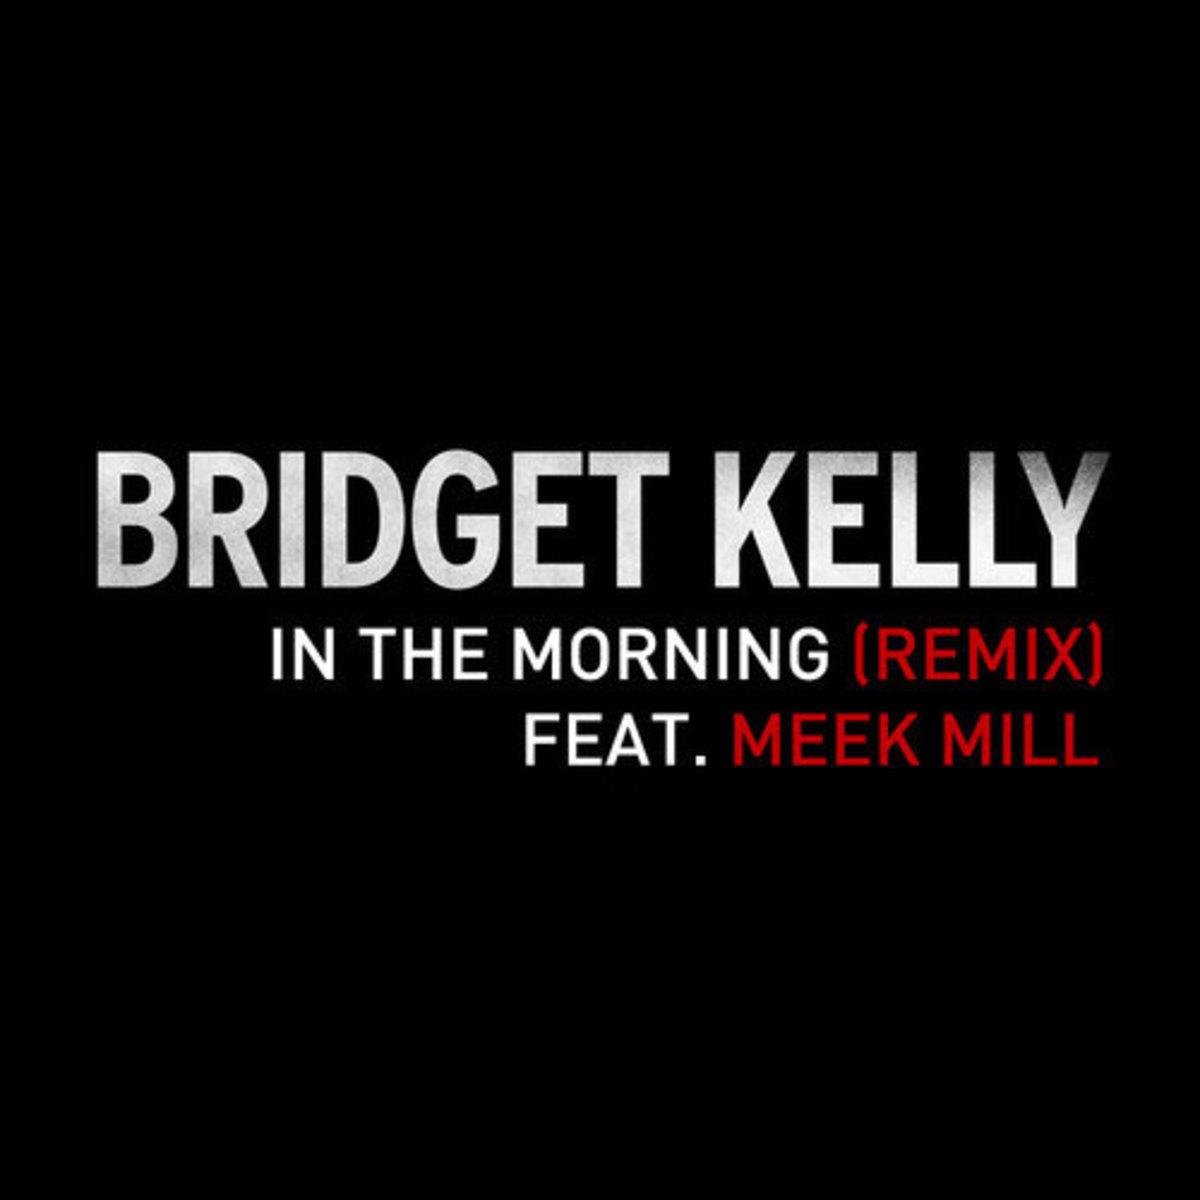 bridgetkelly-morningrmx.jpg